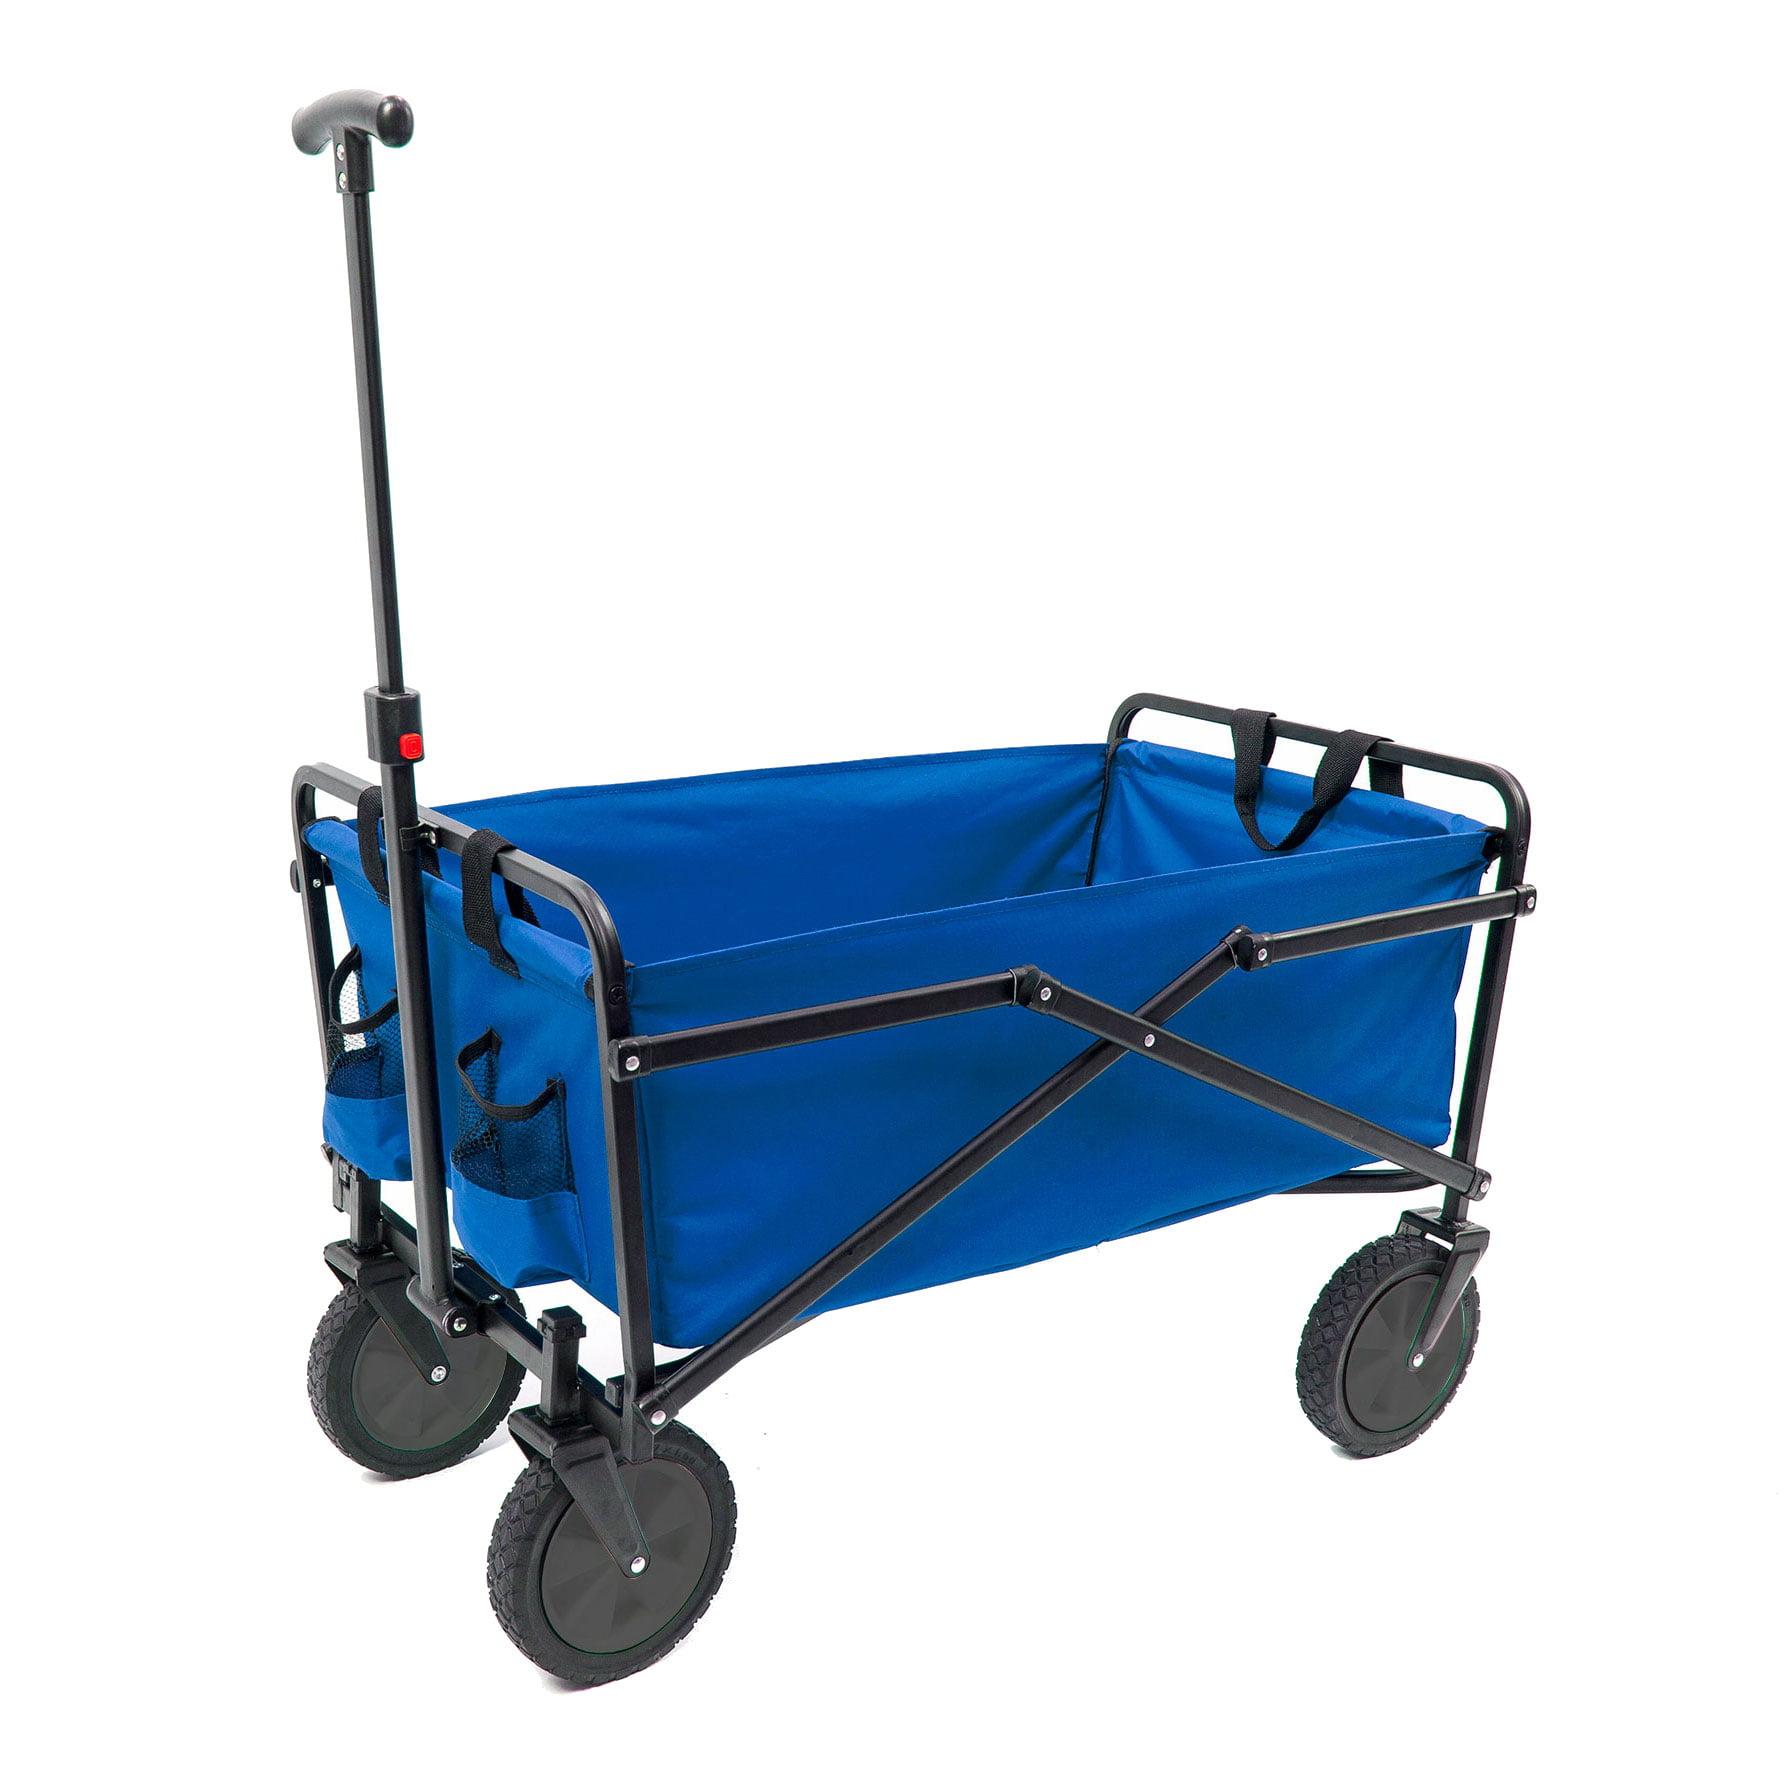 Seina Heavy Duty Compact Folding 150 Pound Capacity Outdoor Utility Cart, Blue